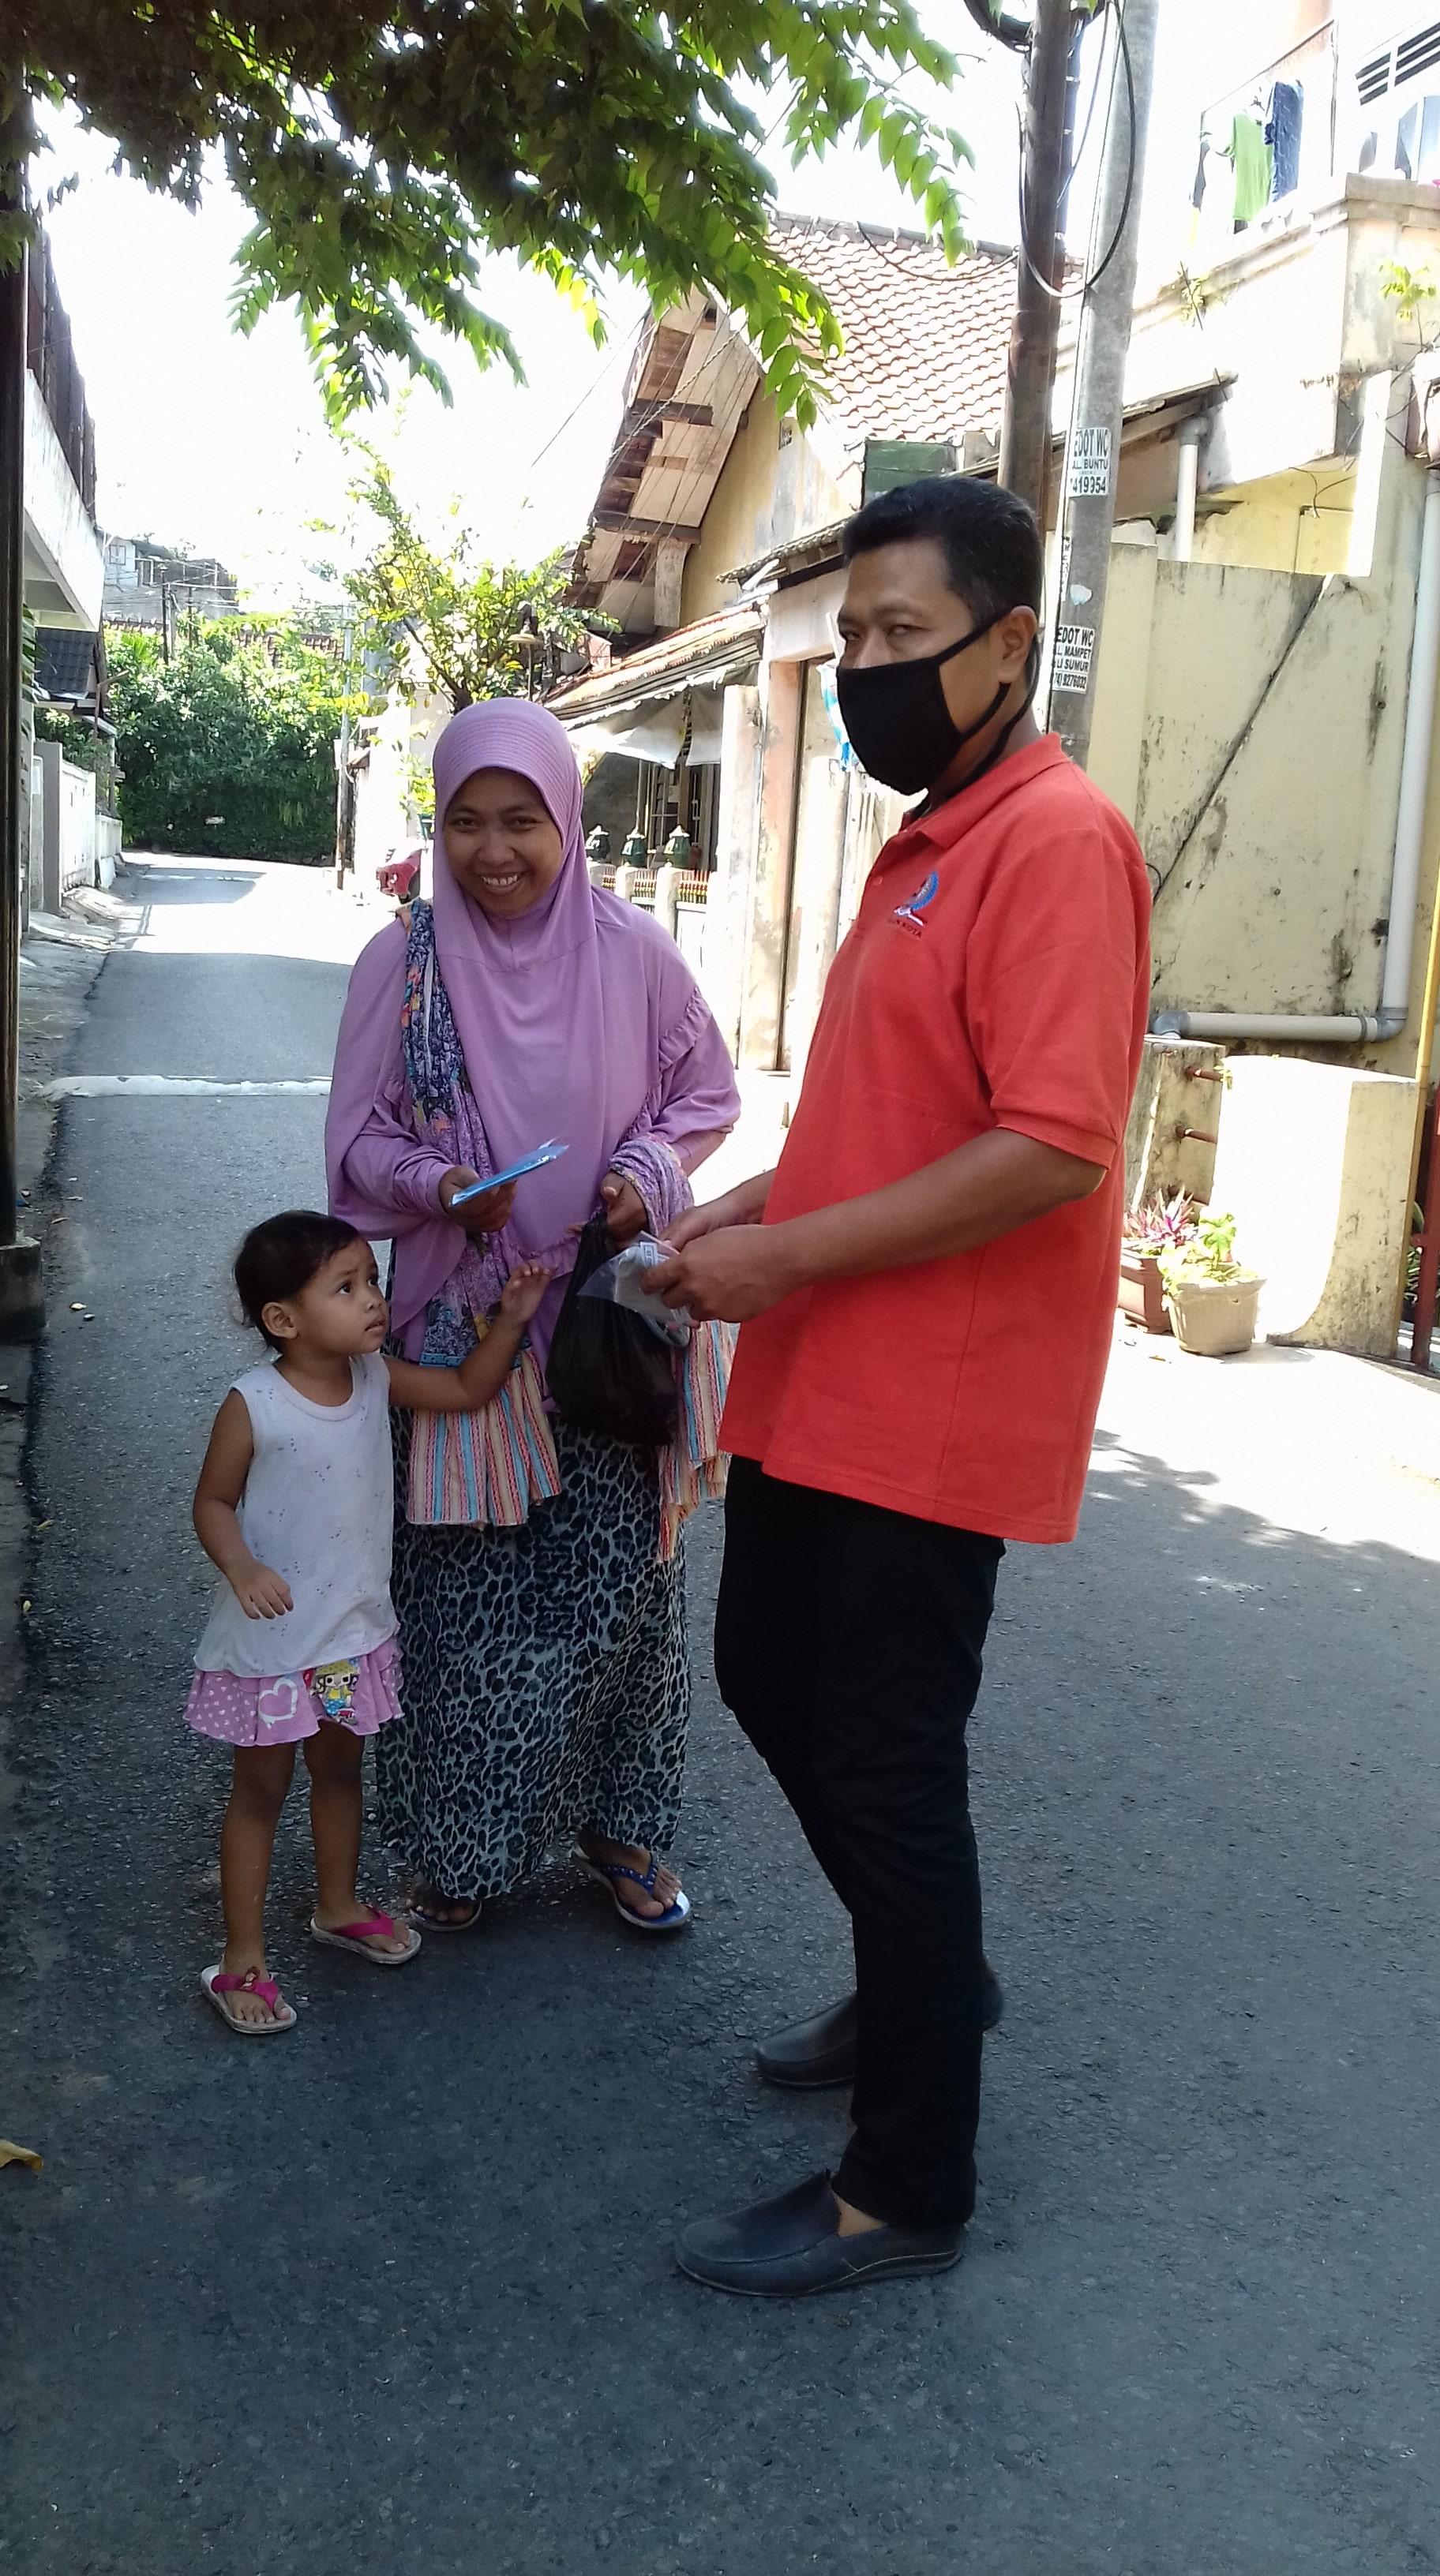 Sosialisasi pencegahan virus corona atau covid 19 di Kelurahan Klitren Yogyakarta